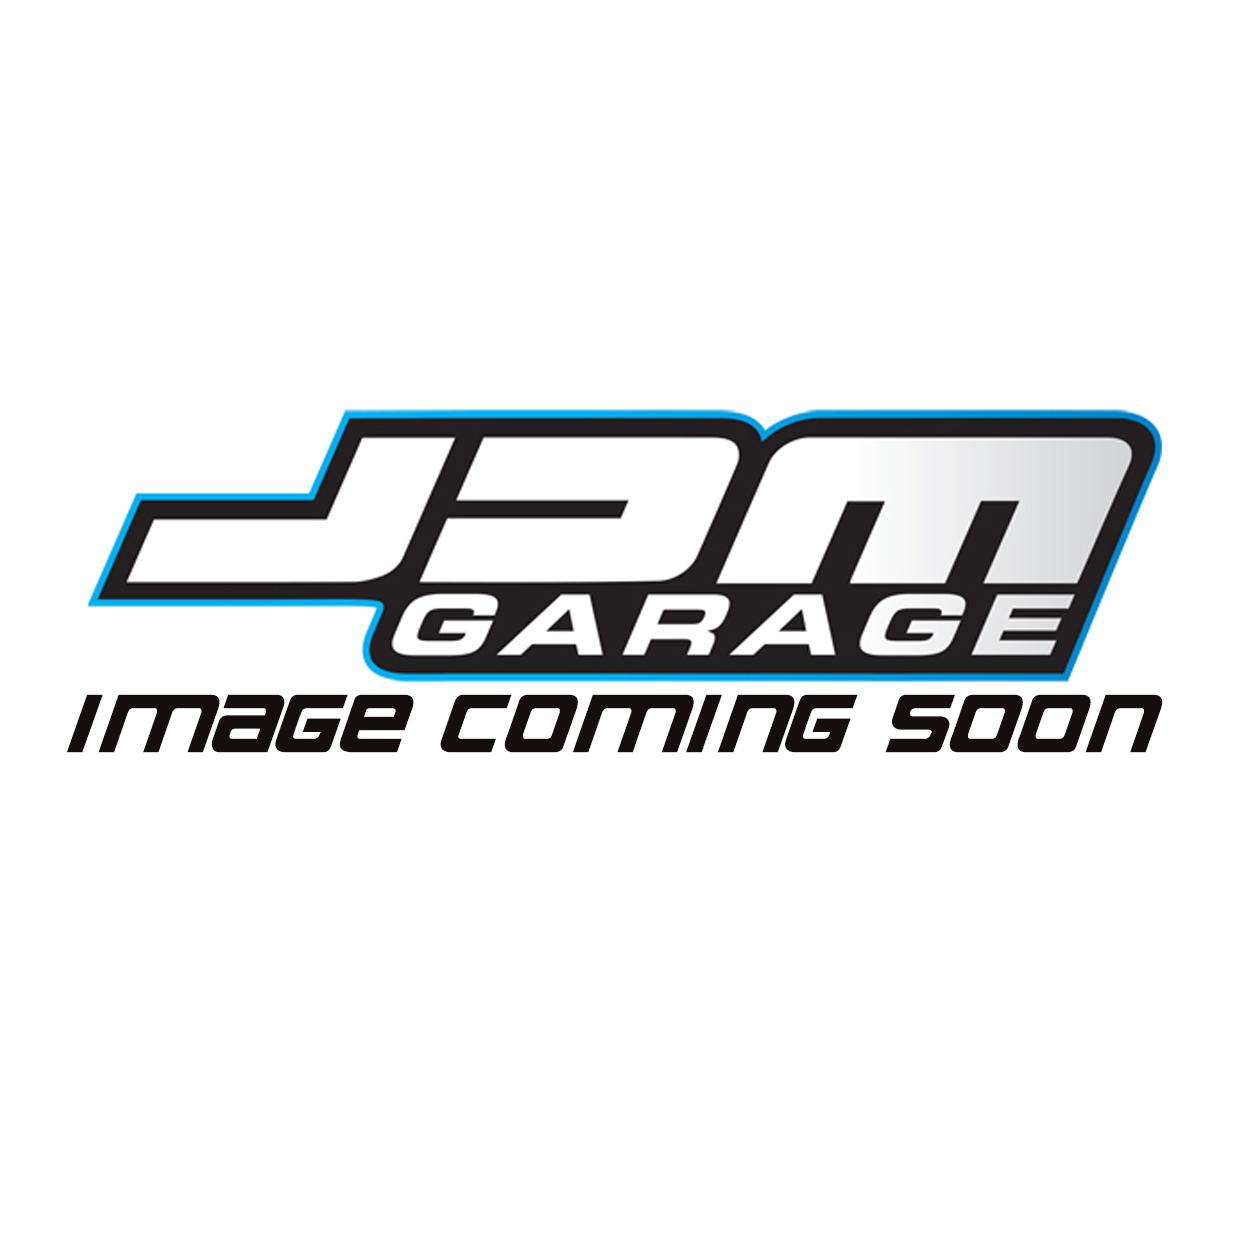 Genuine Nissan Water Pump - R35 GTR VR38DETT - B1010-JK20A